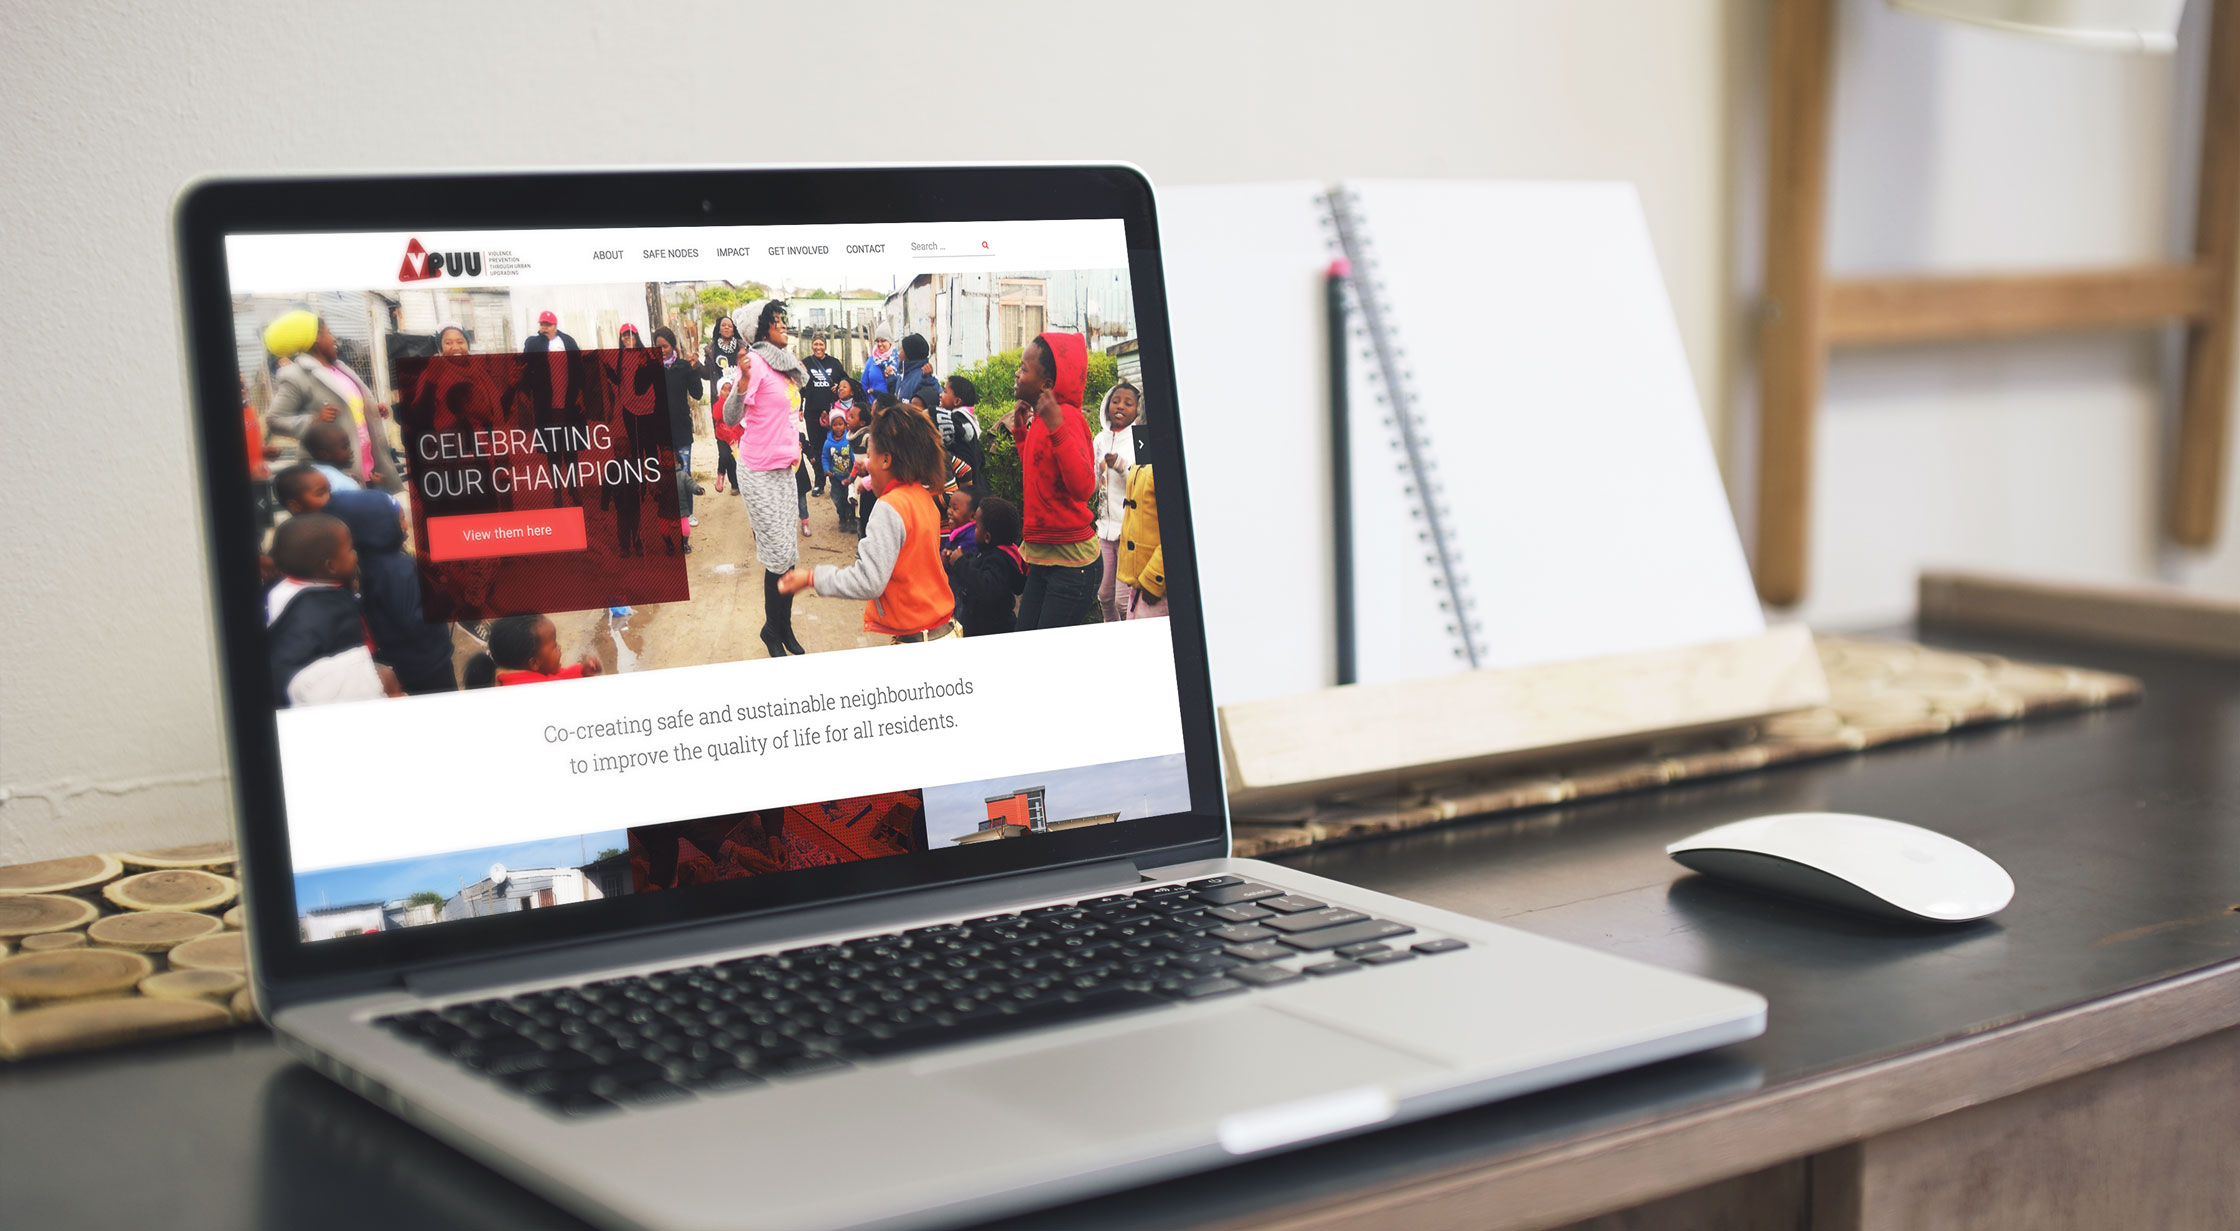 VPUU mobile friendly website design